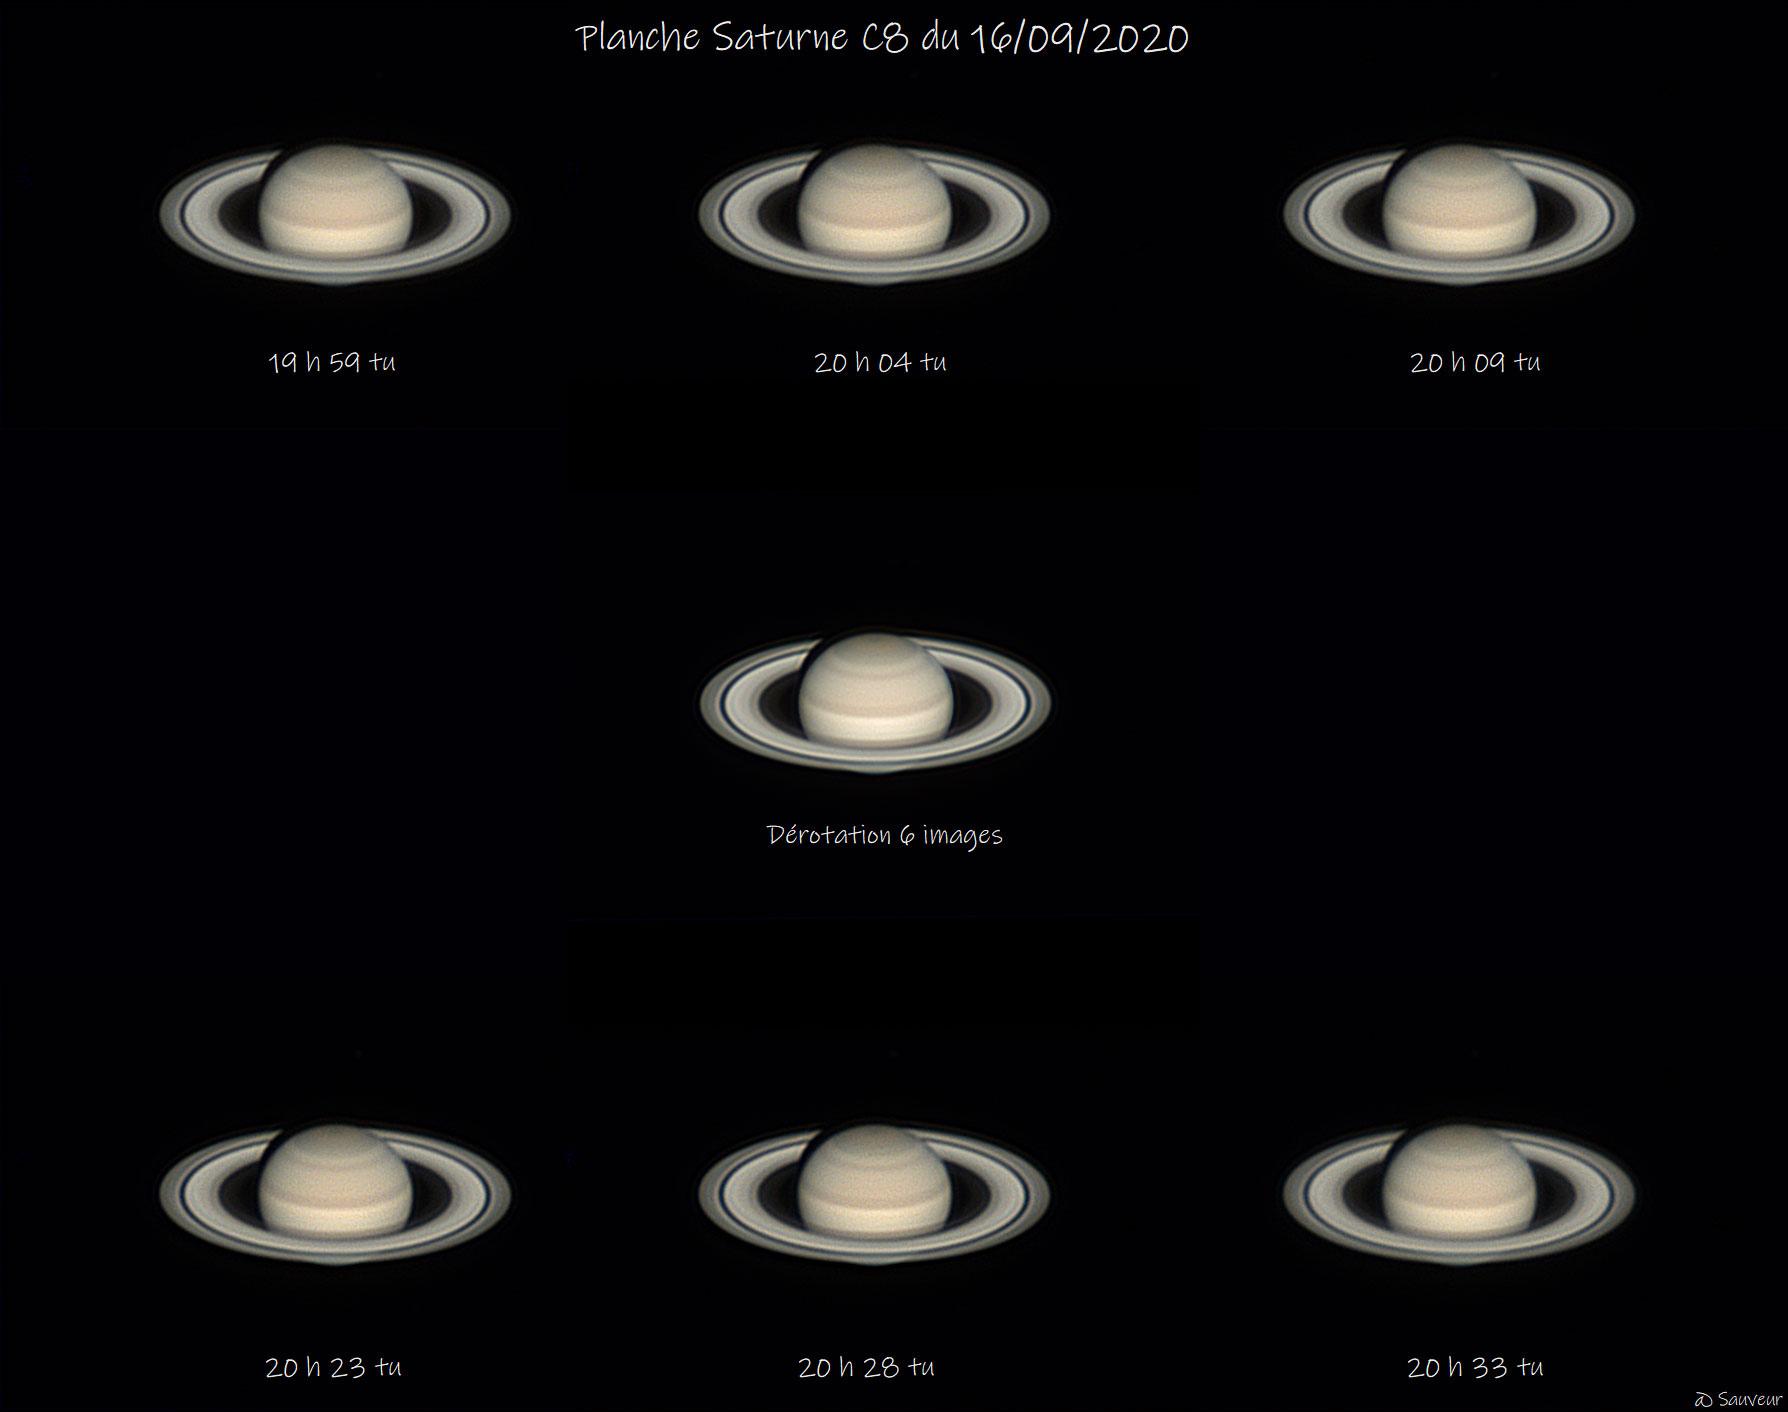 2020-09-16-2023_5-S-L.jpg.f423df9561c1dc2d67d6abac16fd06c3.jpg